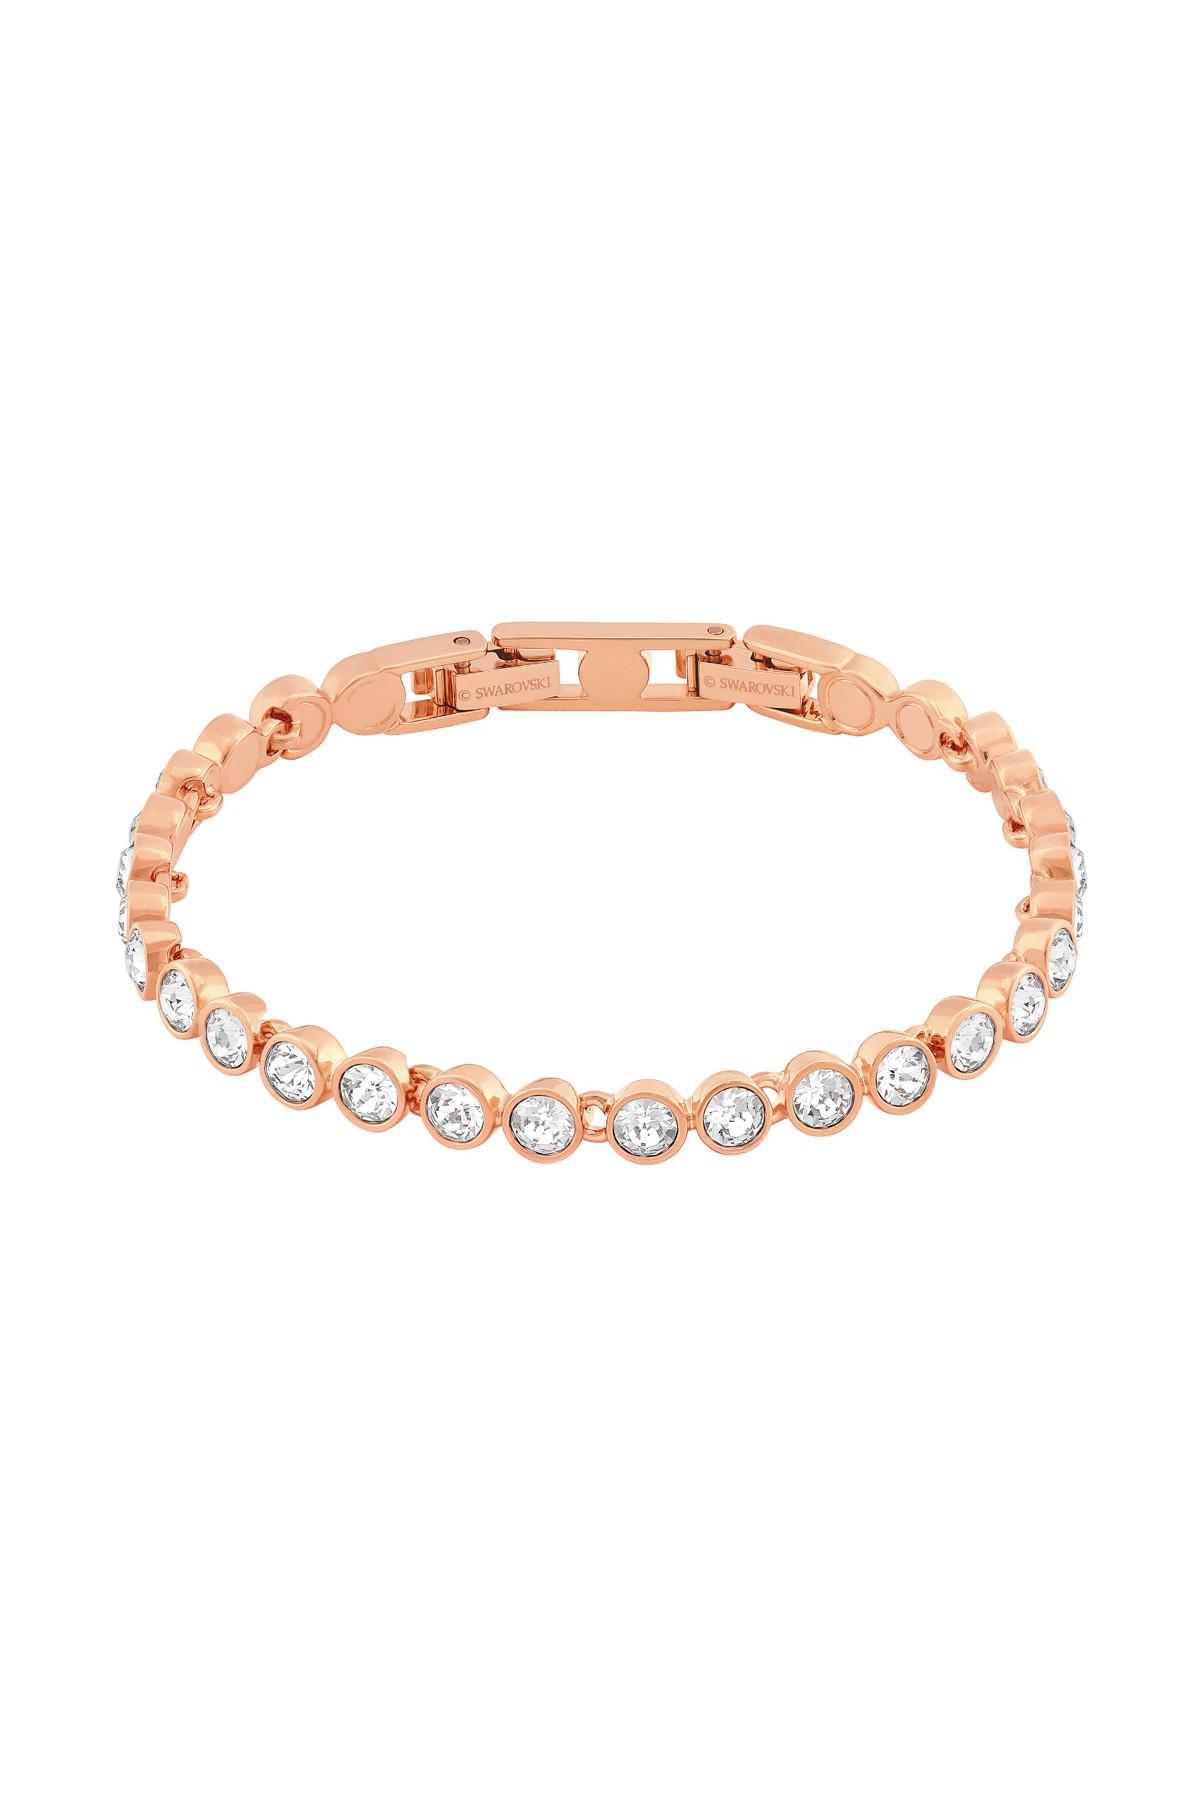 Swarovski Kadın Bilezik Tennis:Bracelet Cry/Ros M 5039938 1